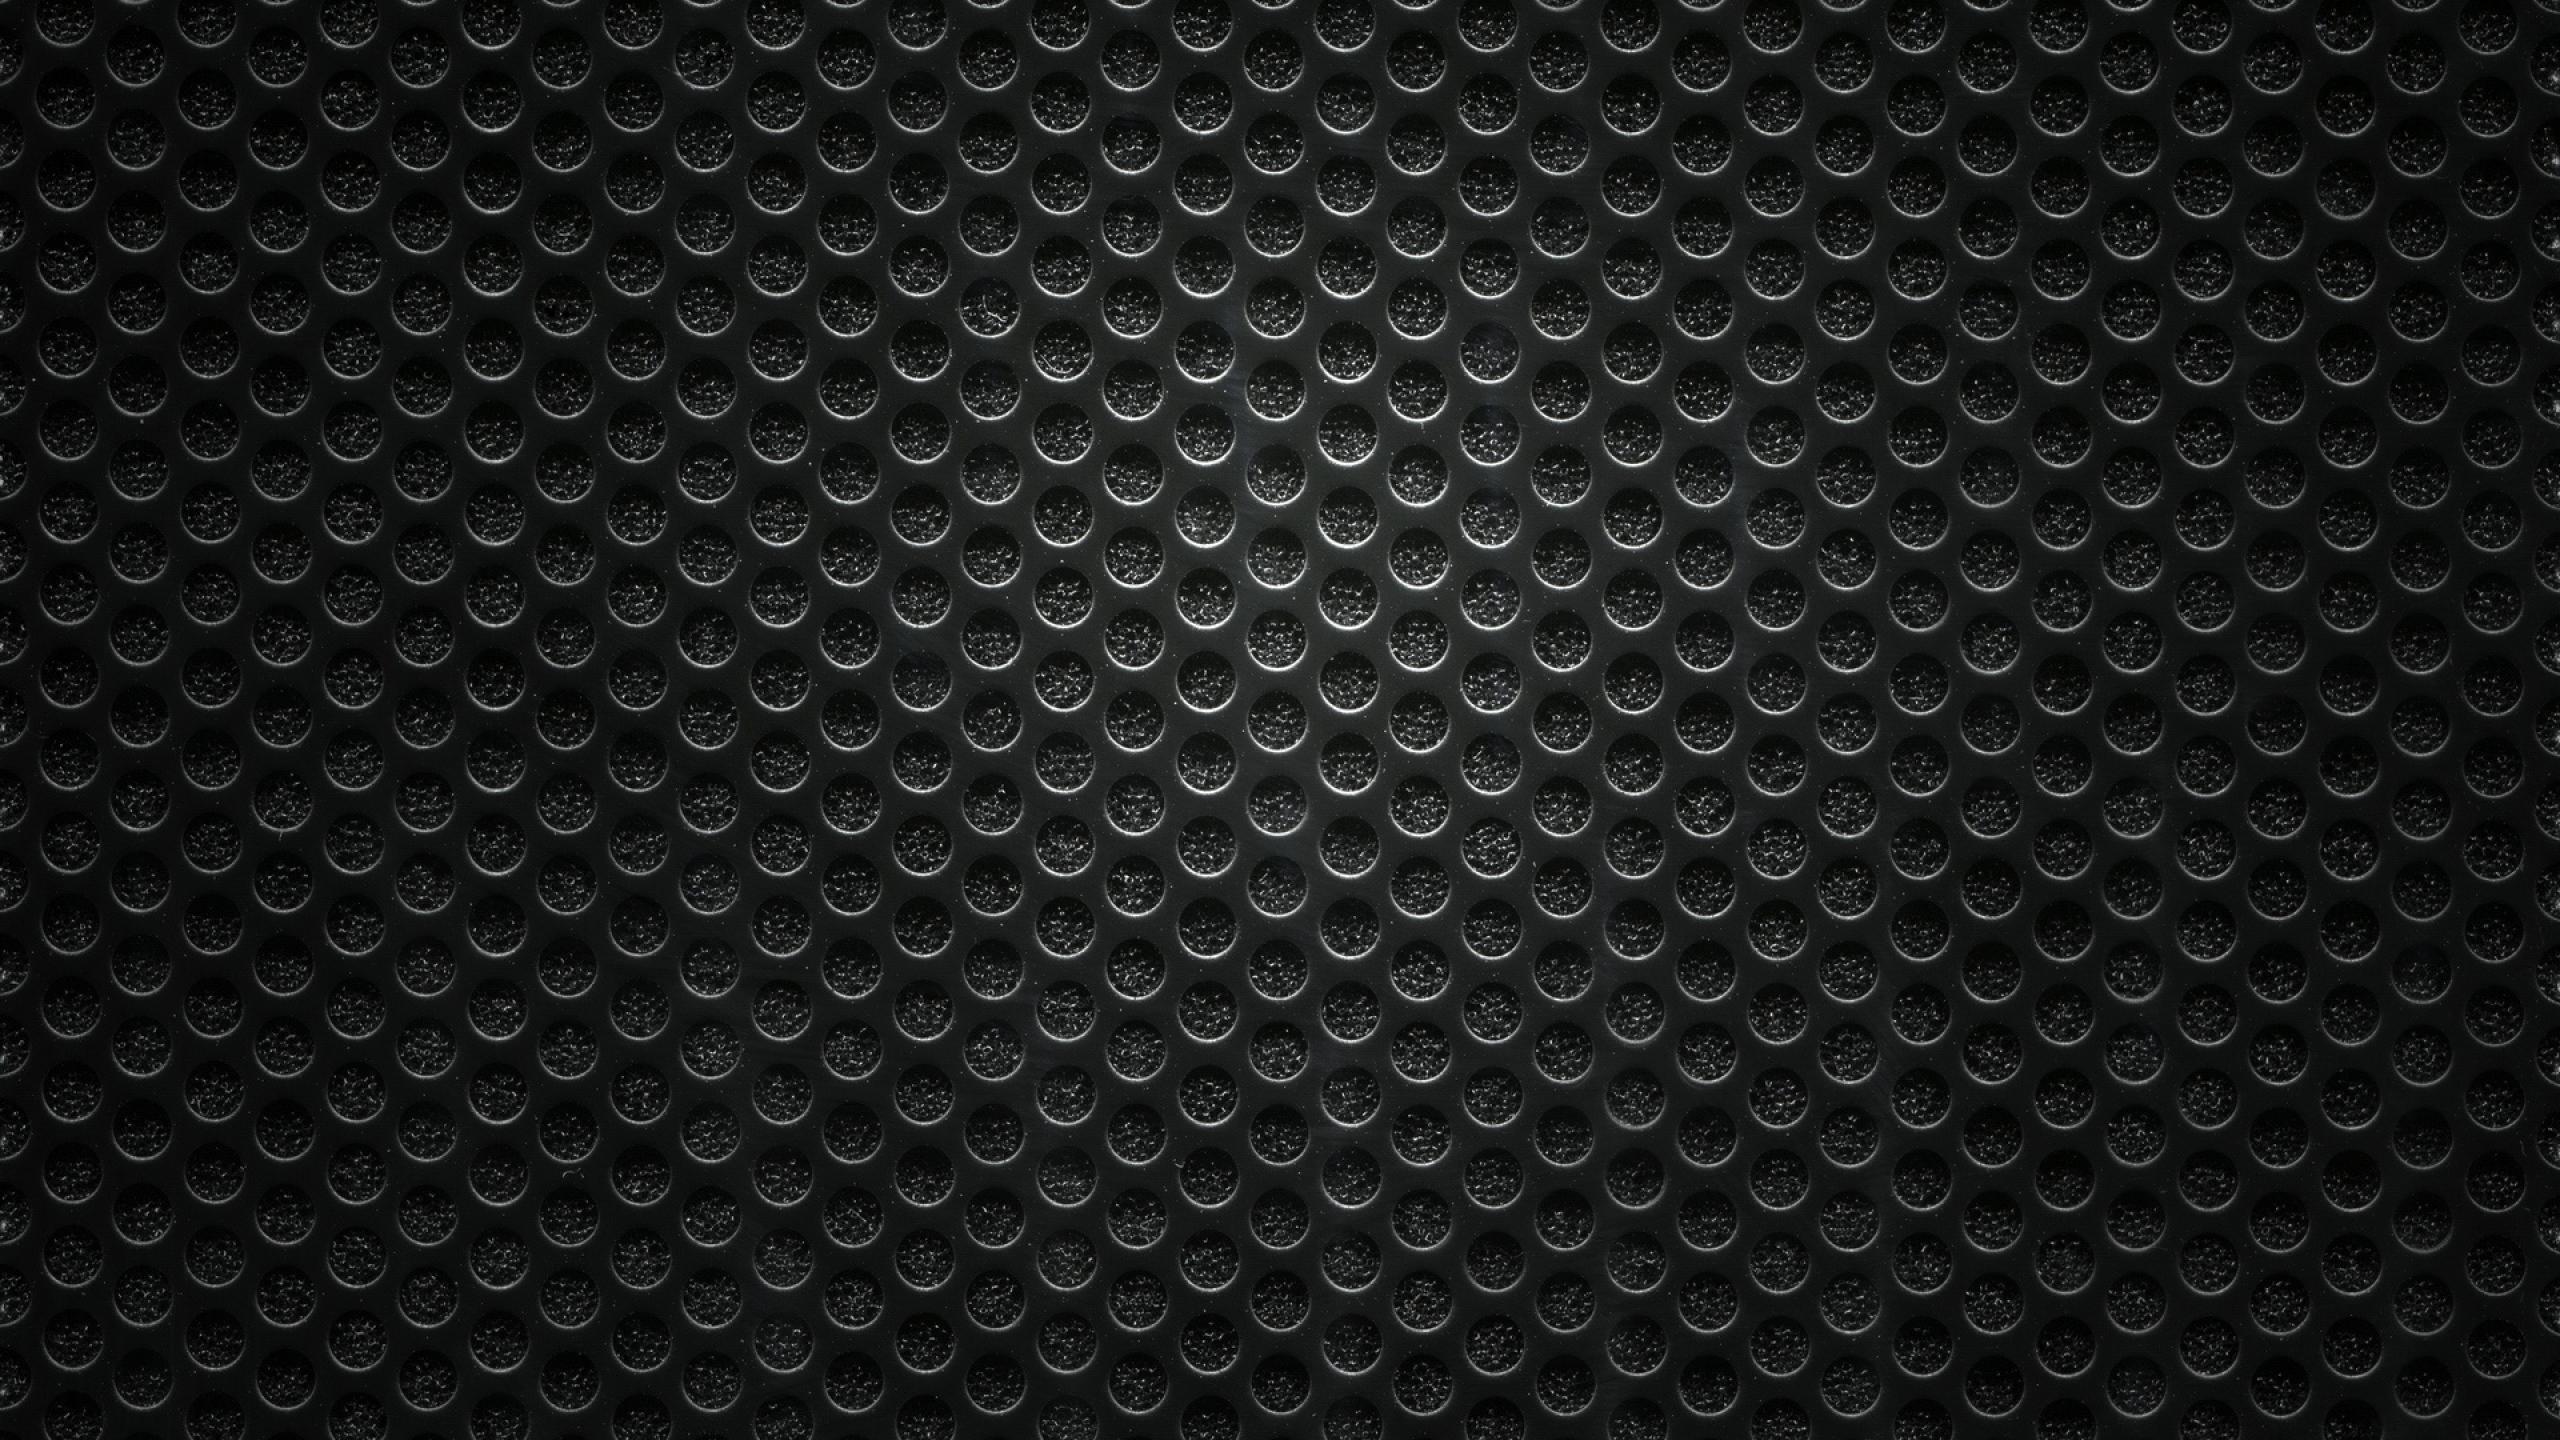 black_background_texture_86812_2560x1440